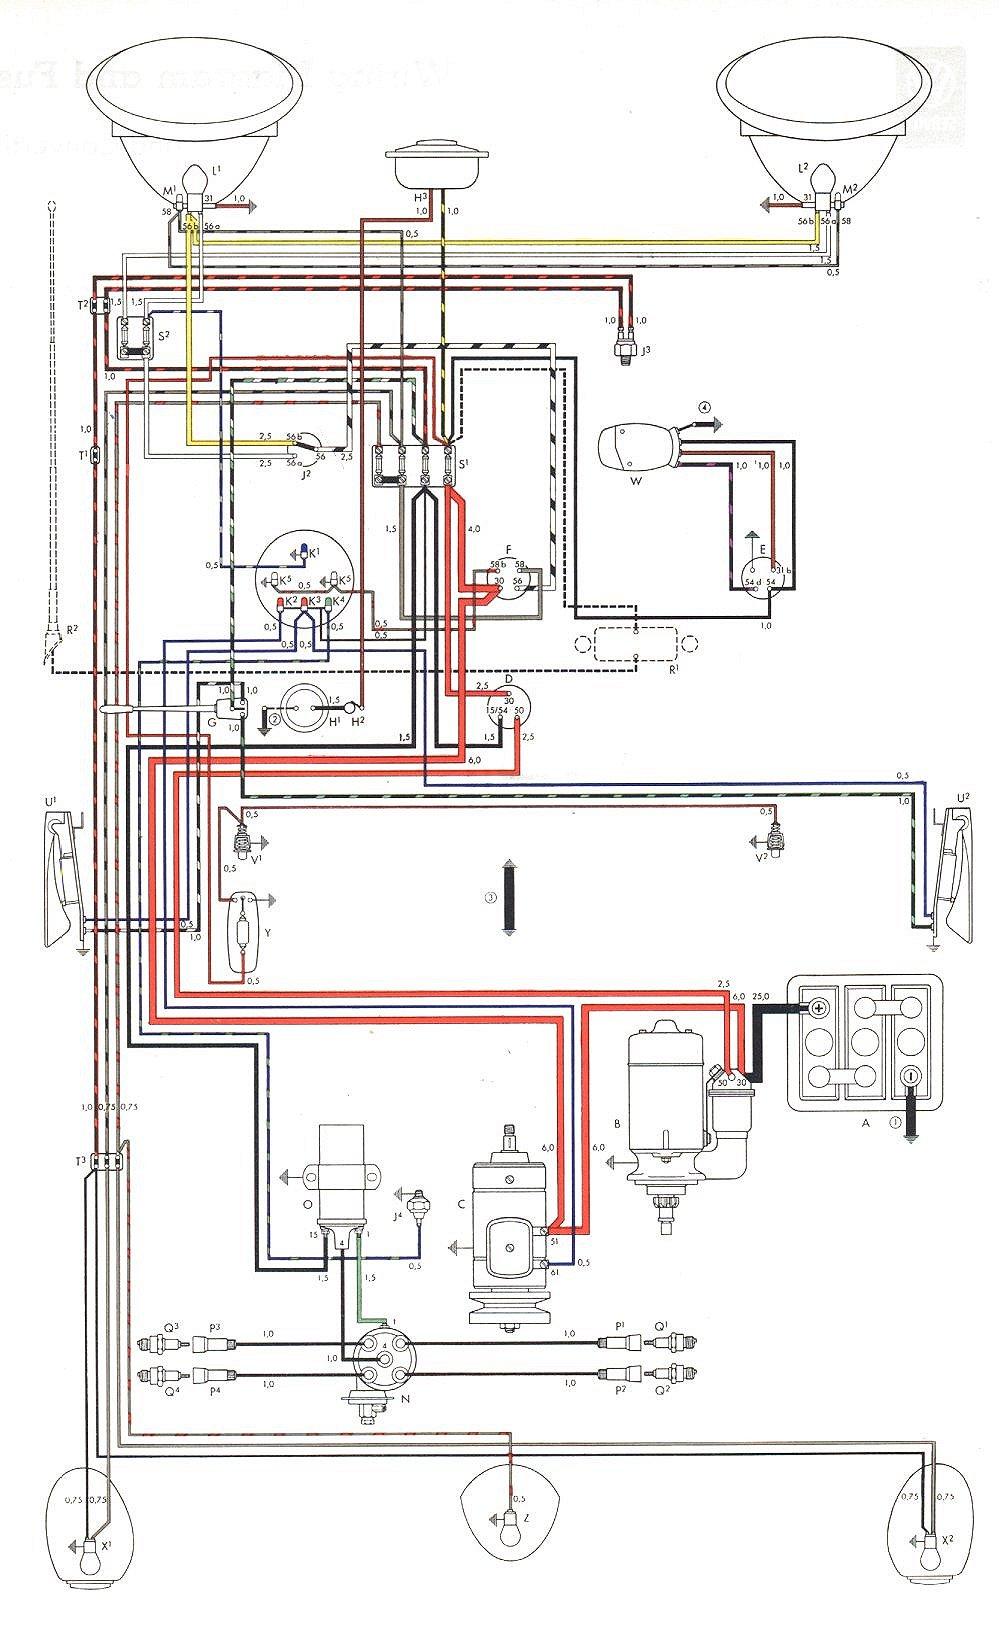 Fuel Gauge Wiring Diagram For Vw Trike Volkswagen Typ 1